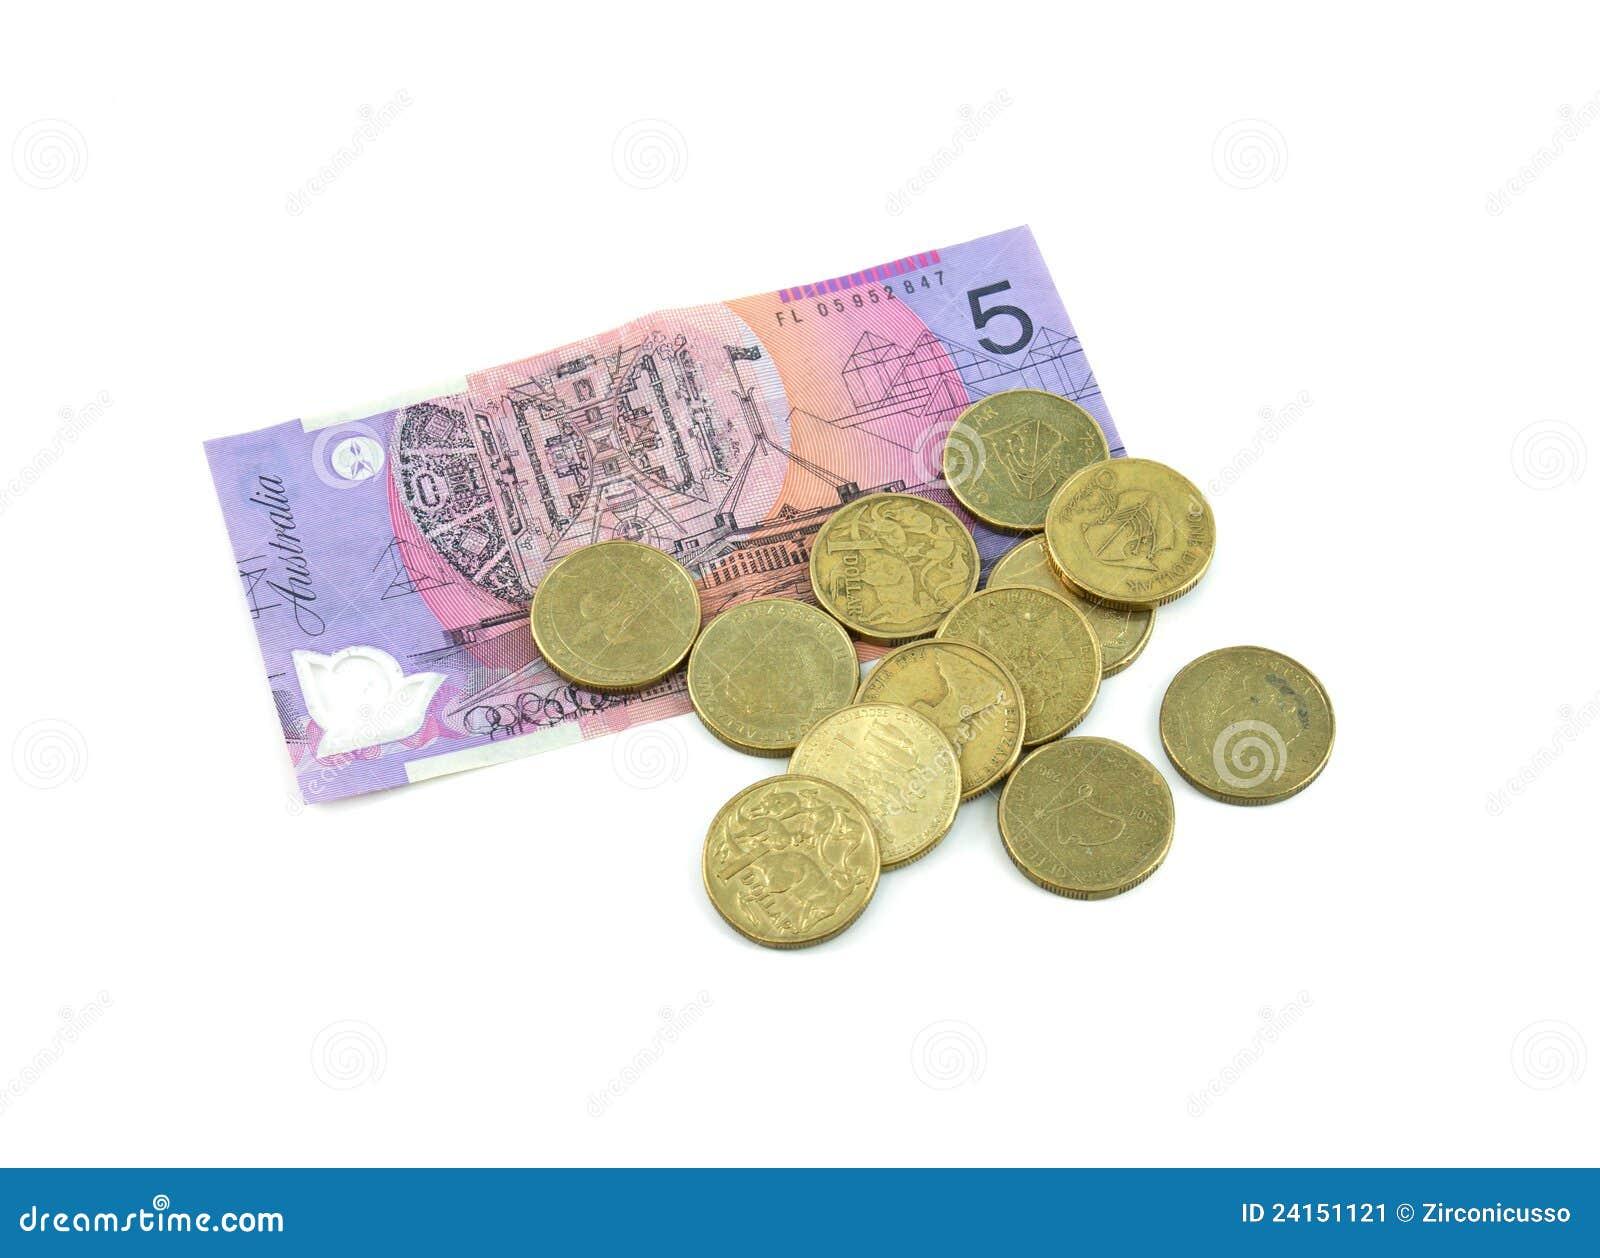 Online sex for money in Sydney